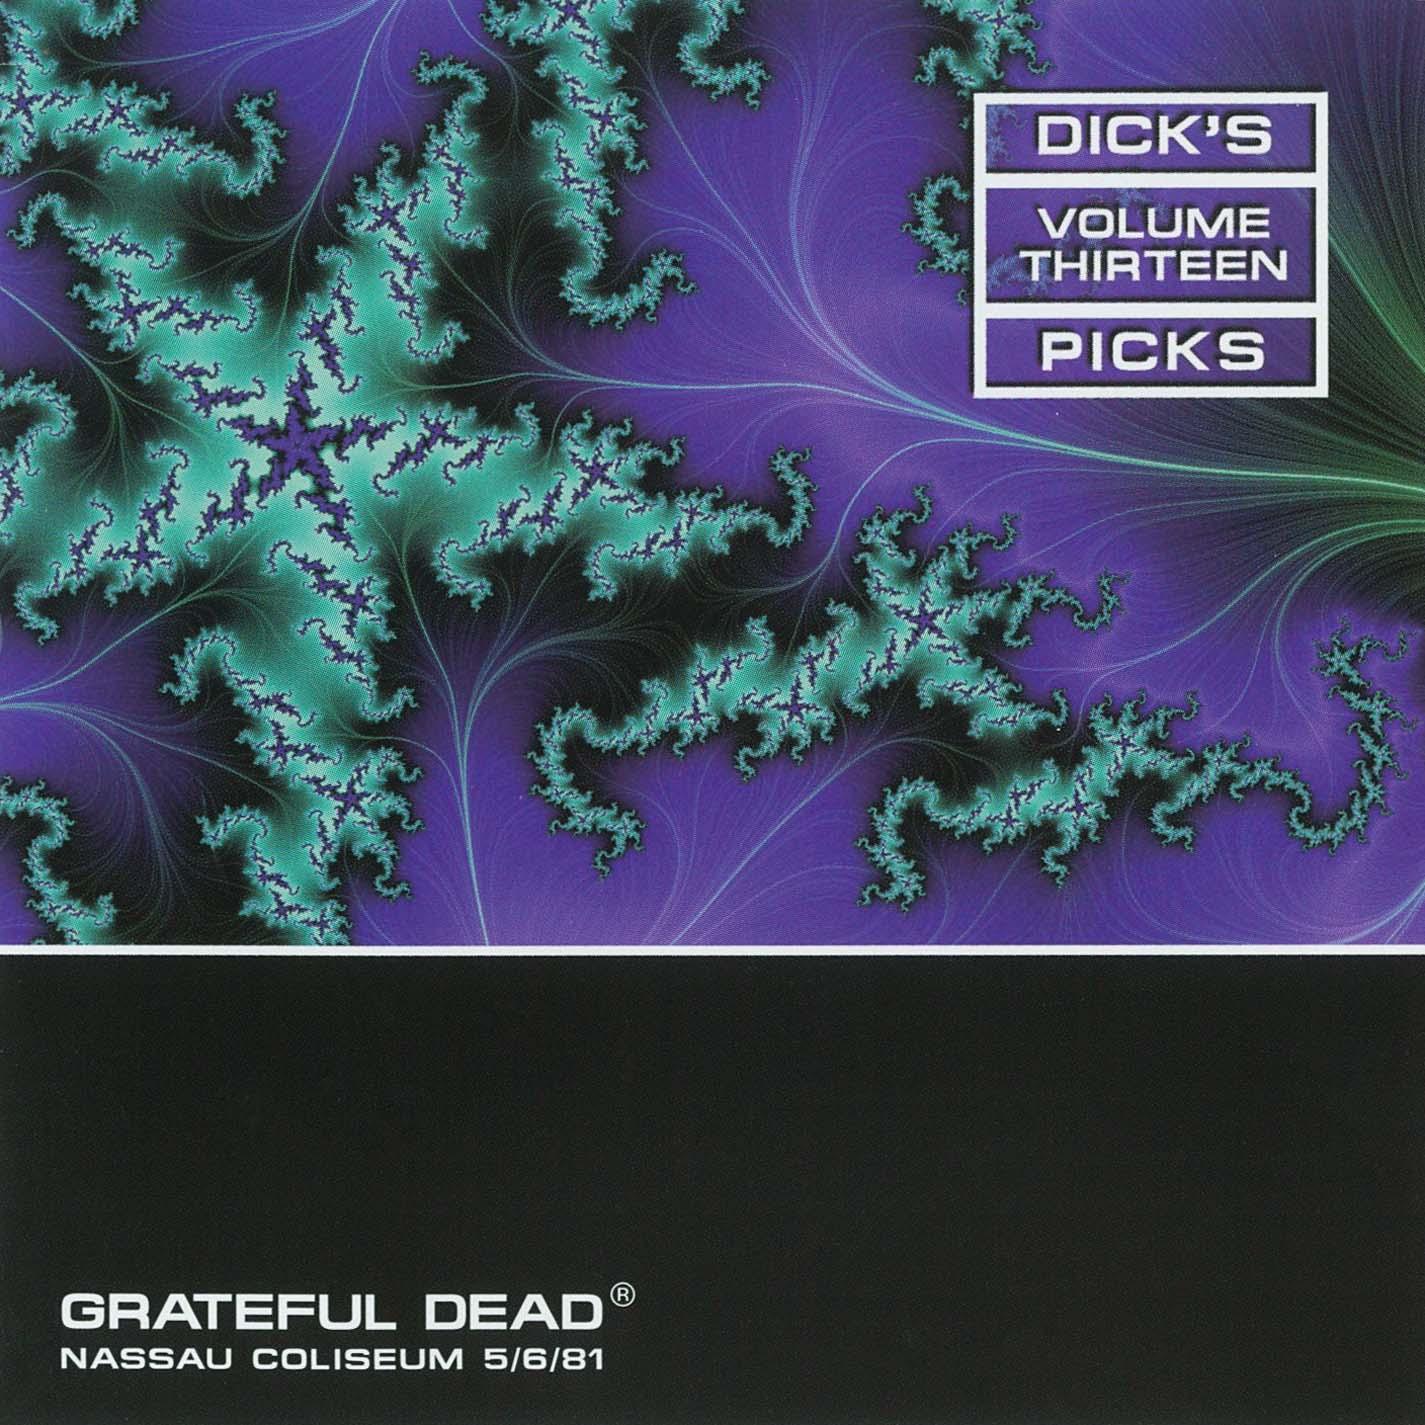 Grateful Dead Dick's Picks 13 album cover artwork